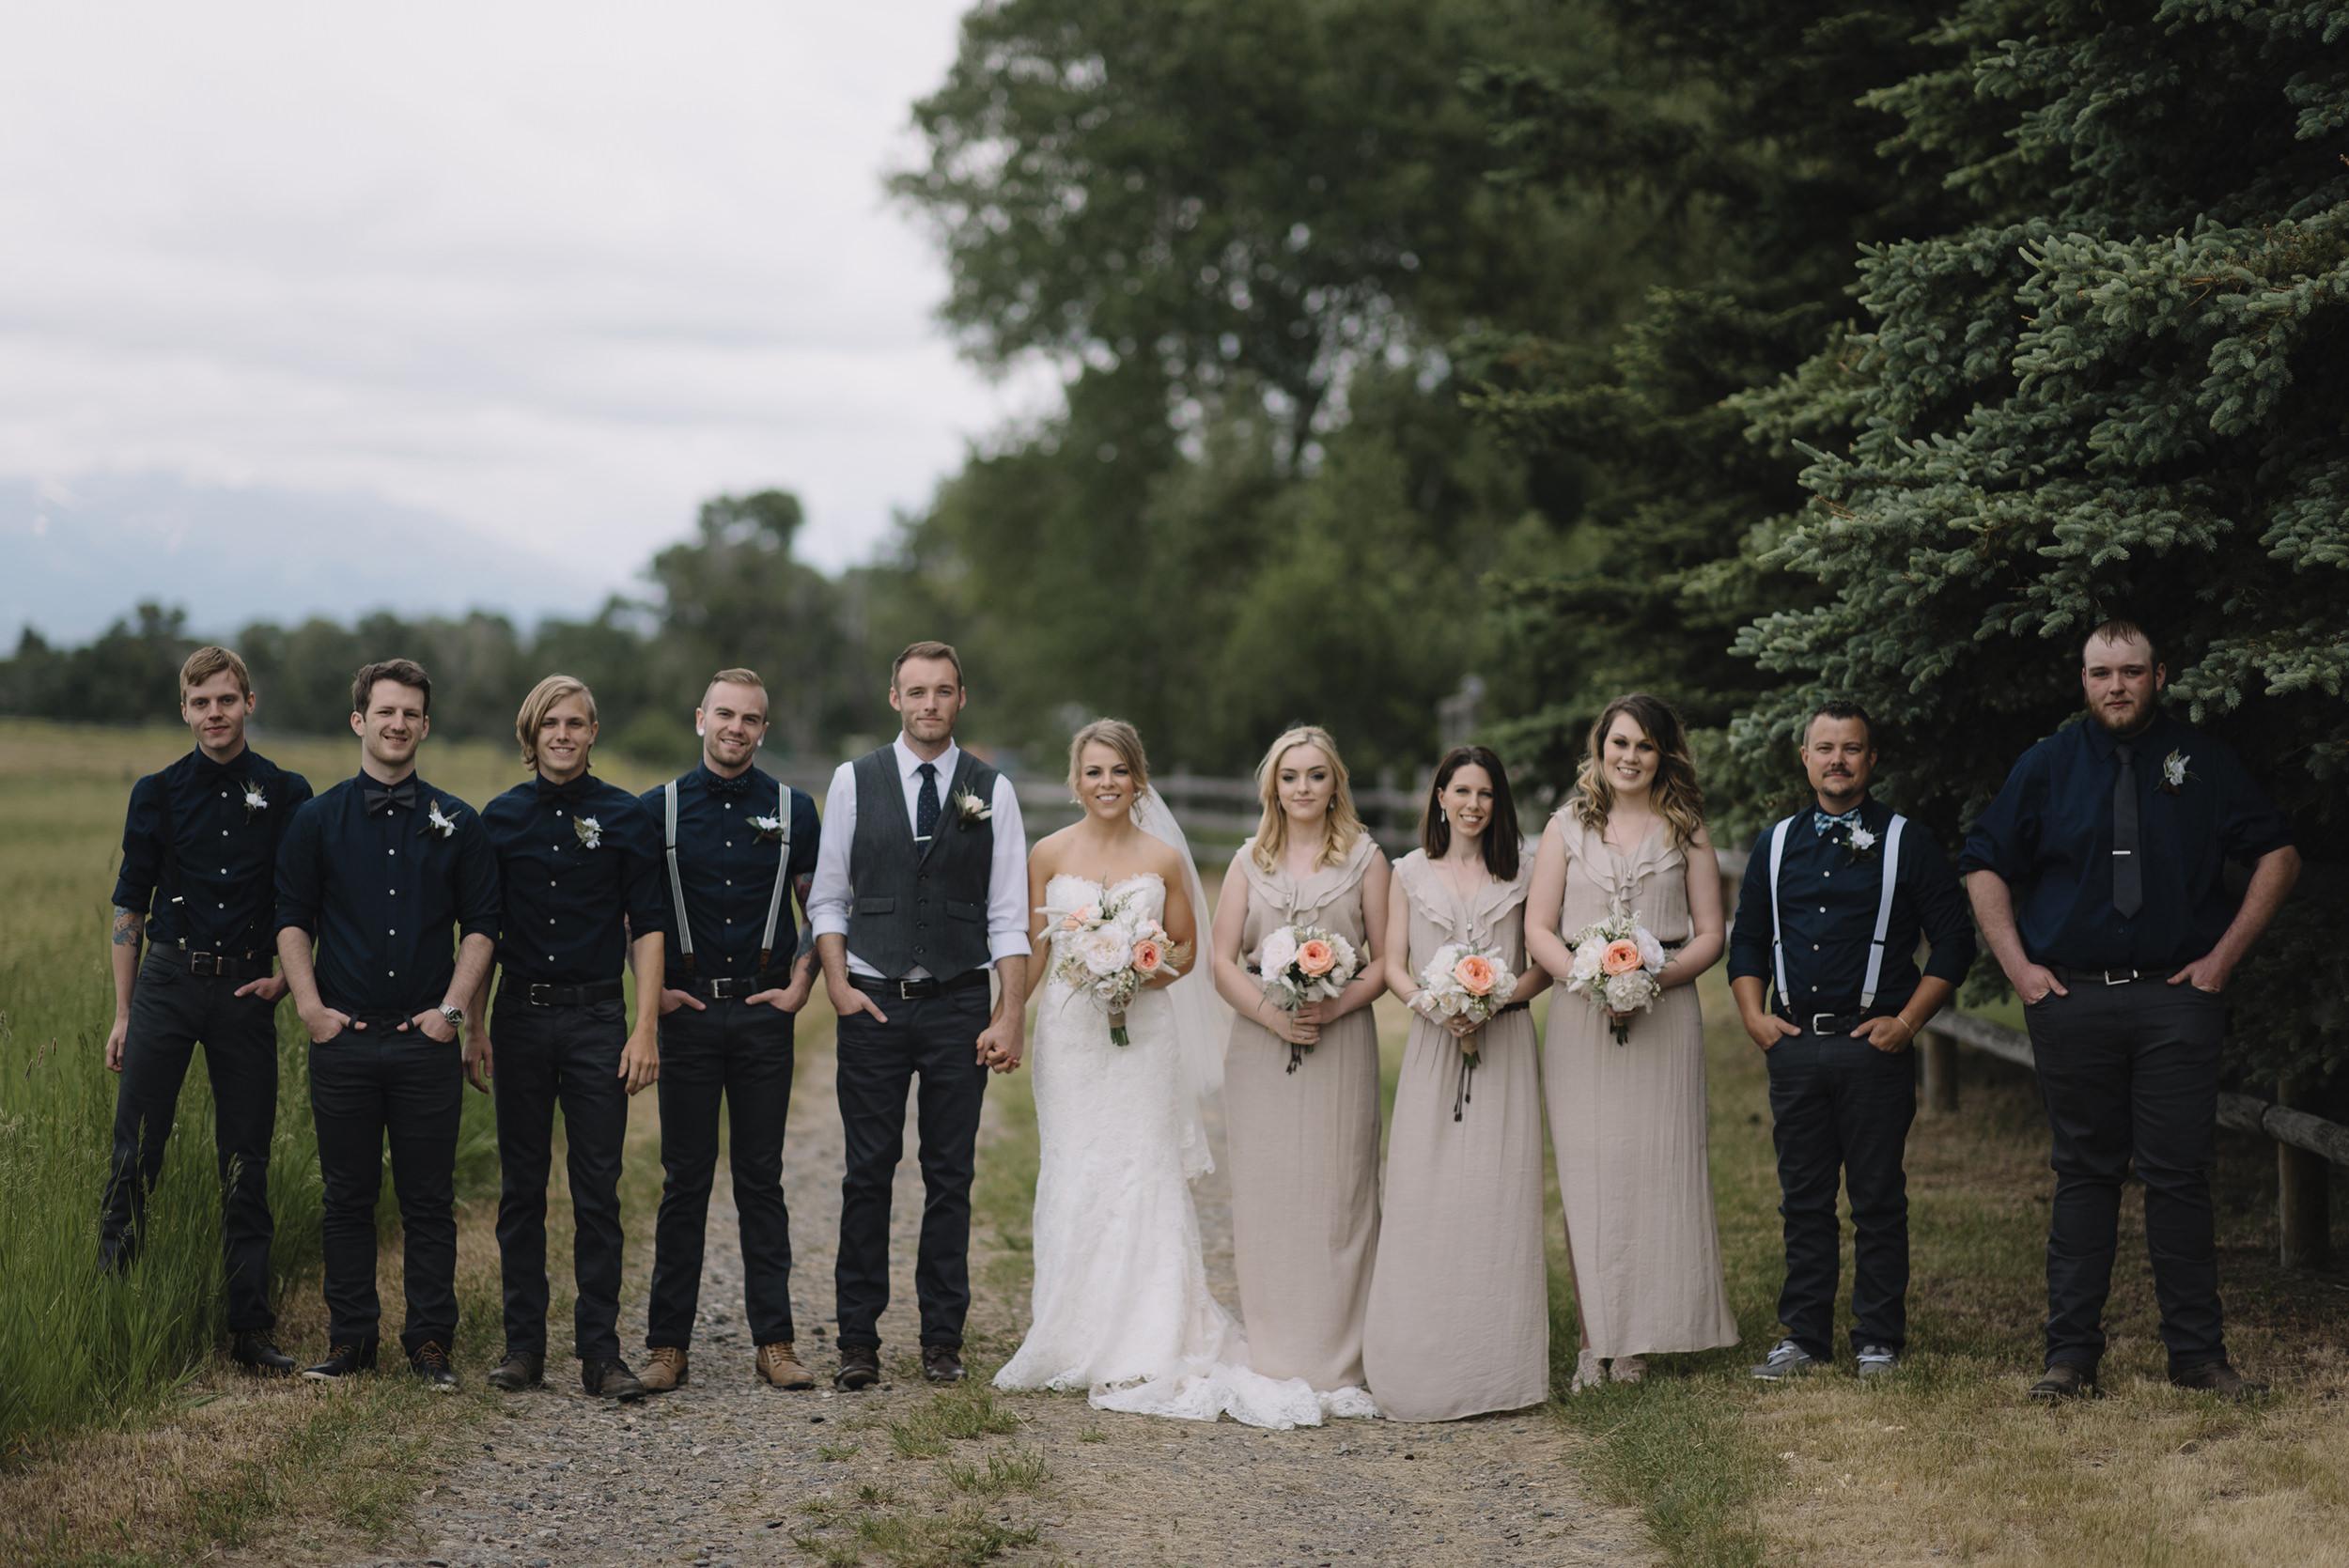 Colby-and-Jess-Intimate-Backyard-Wedding-Bozeman-Montana221.jpg